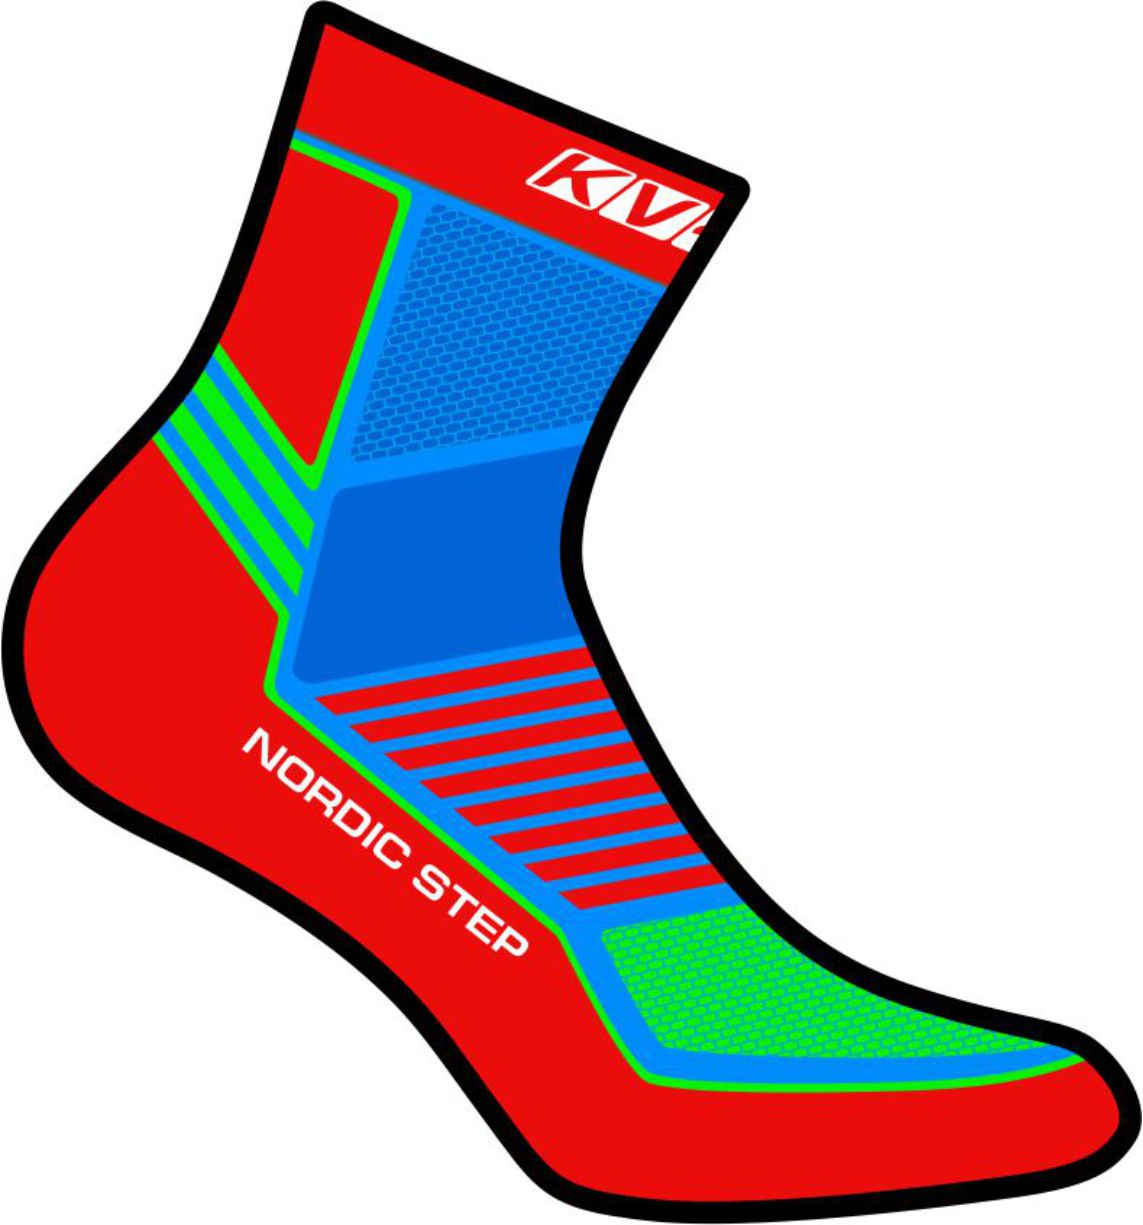 NORDIC STEP SOCKS UNISEX (red)